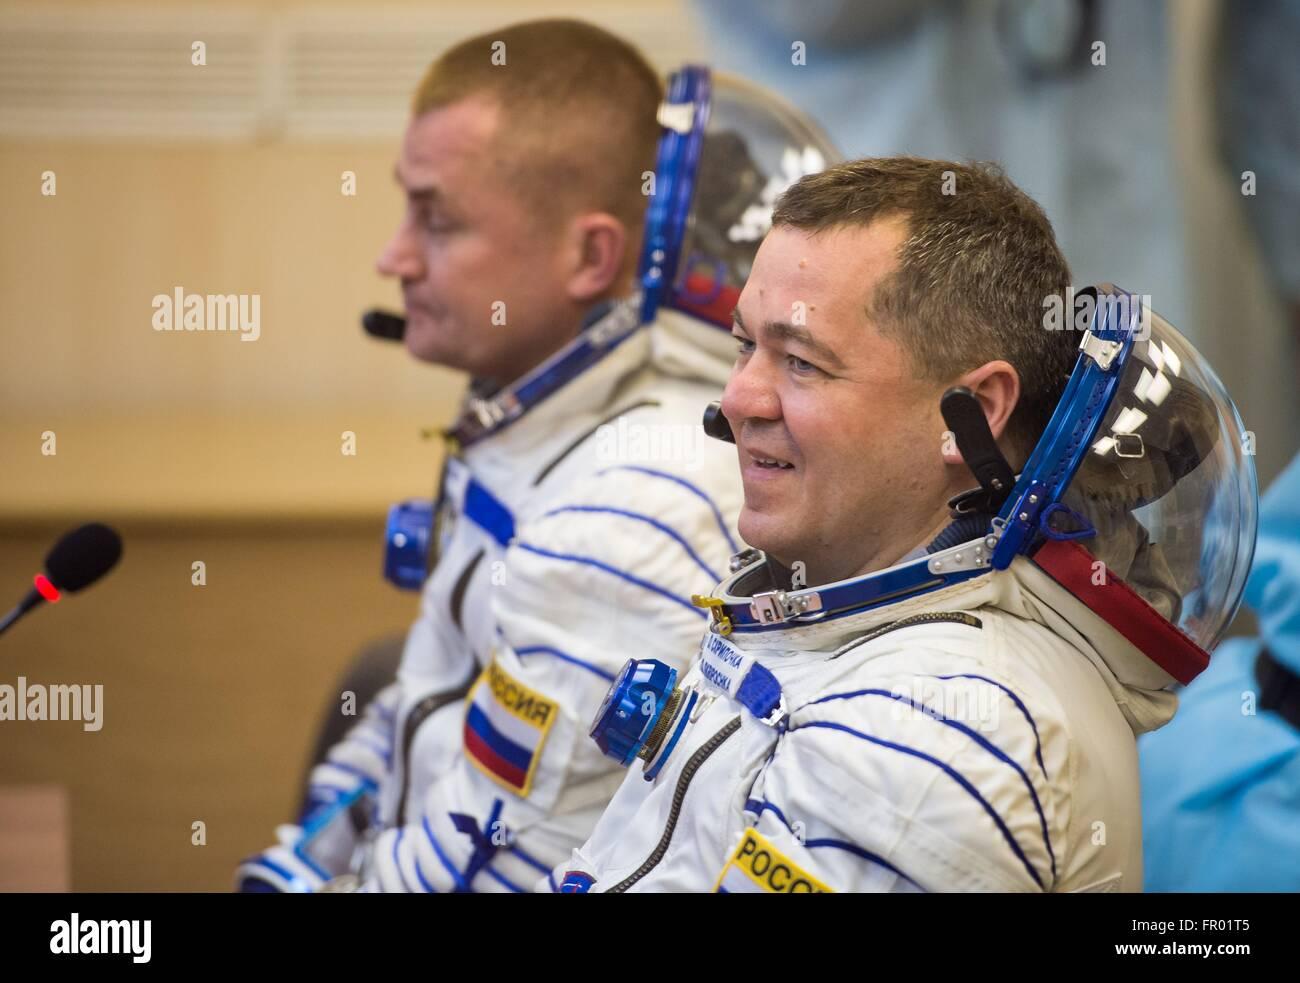 Baikonur, Kazakhstan. 19th Mar, 2016. Russian cosmonaut Oleg Skripochka speaks with family after having his Russian - Stock Image